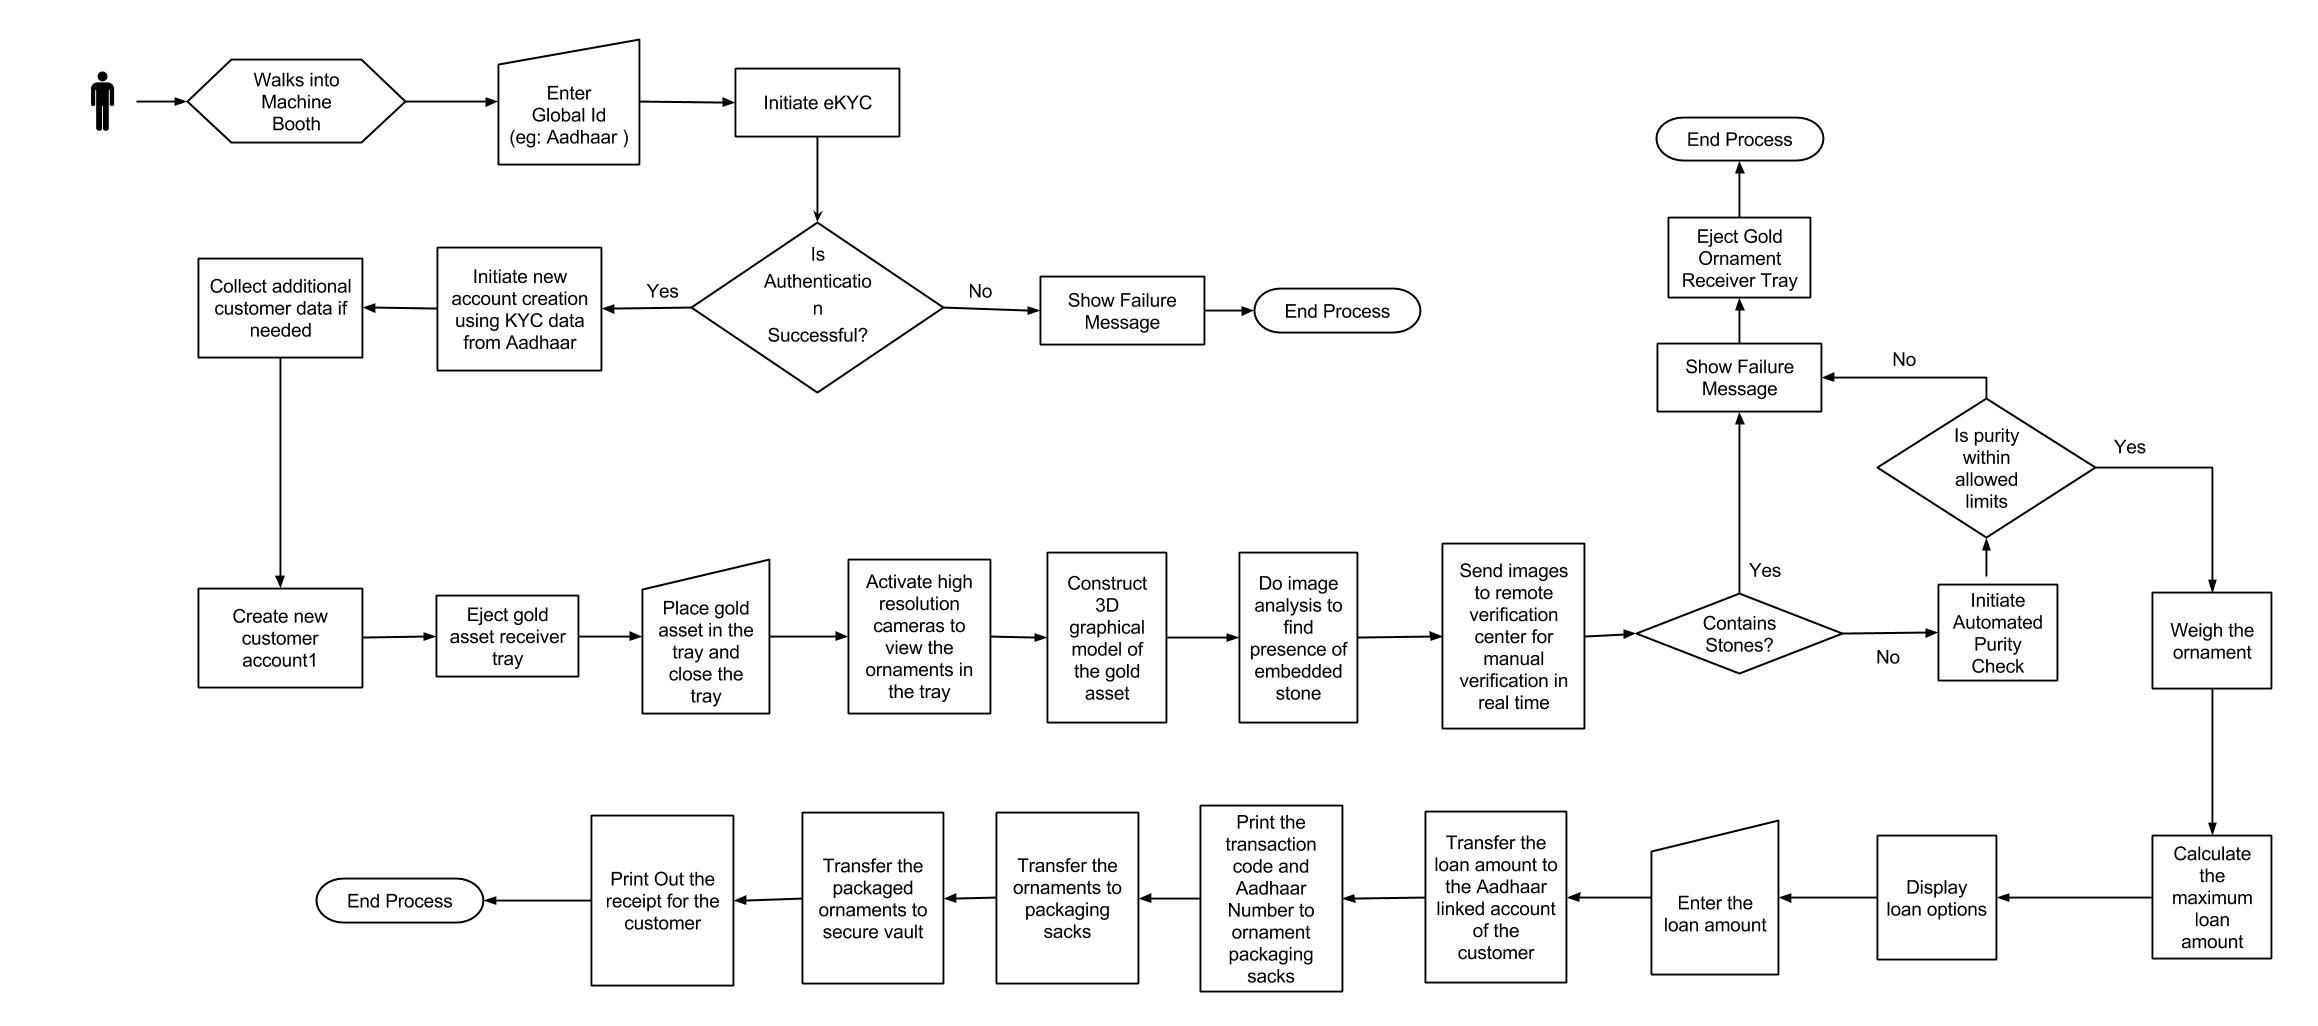 mortgage process diagram briggs amp stratton carburetor gold loan machine finahub